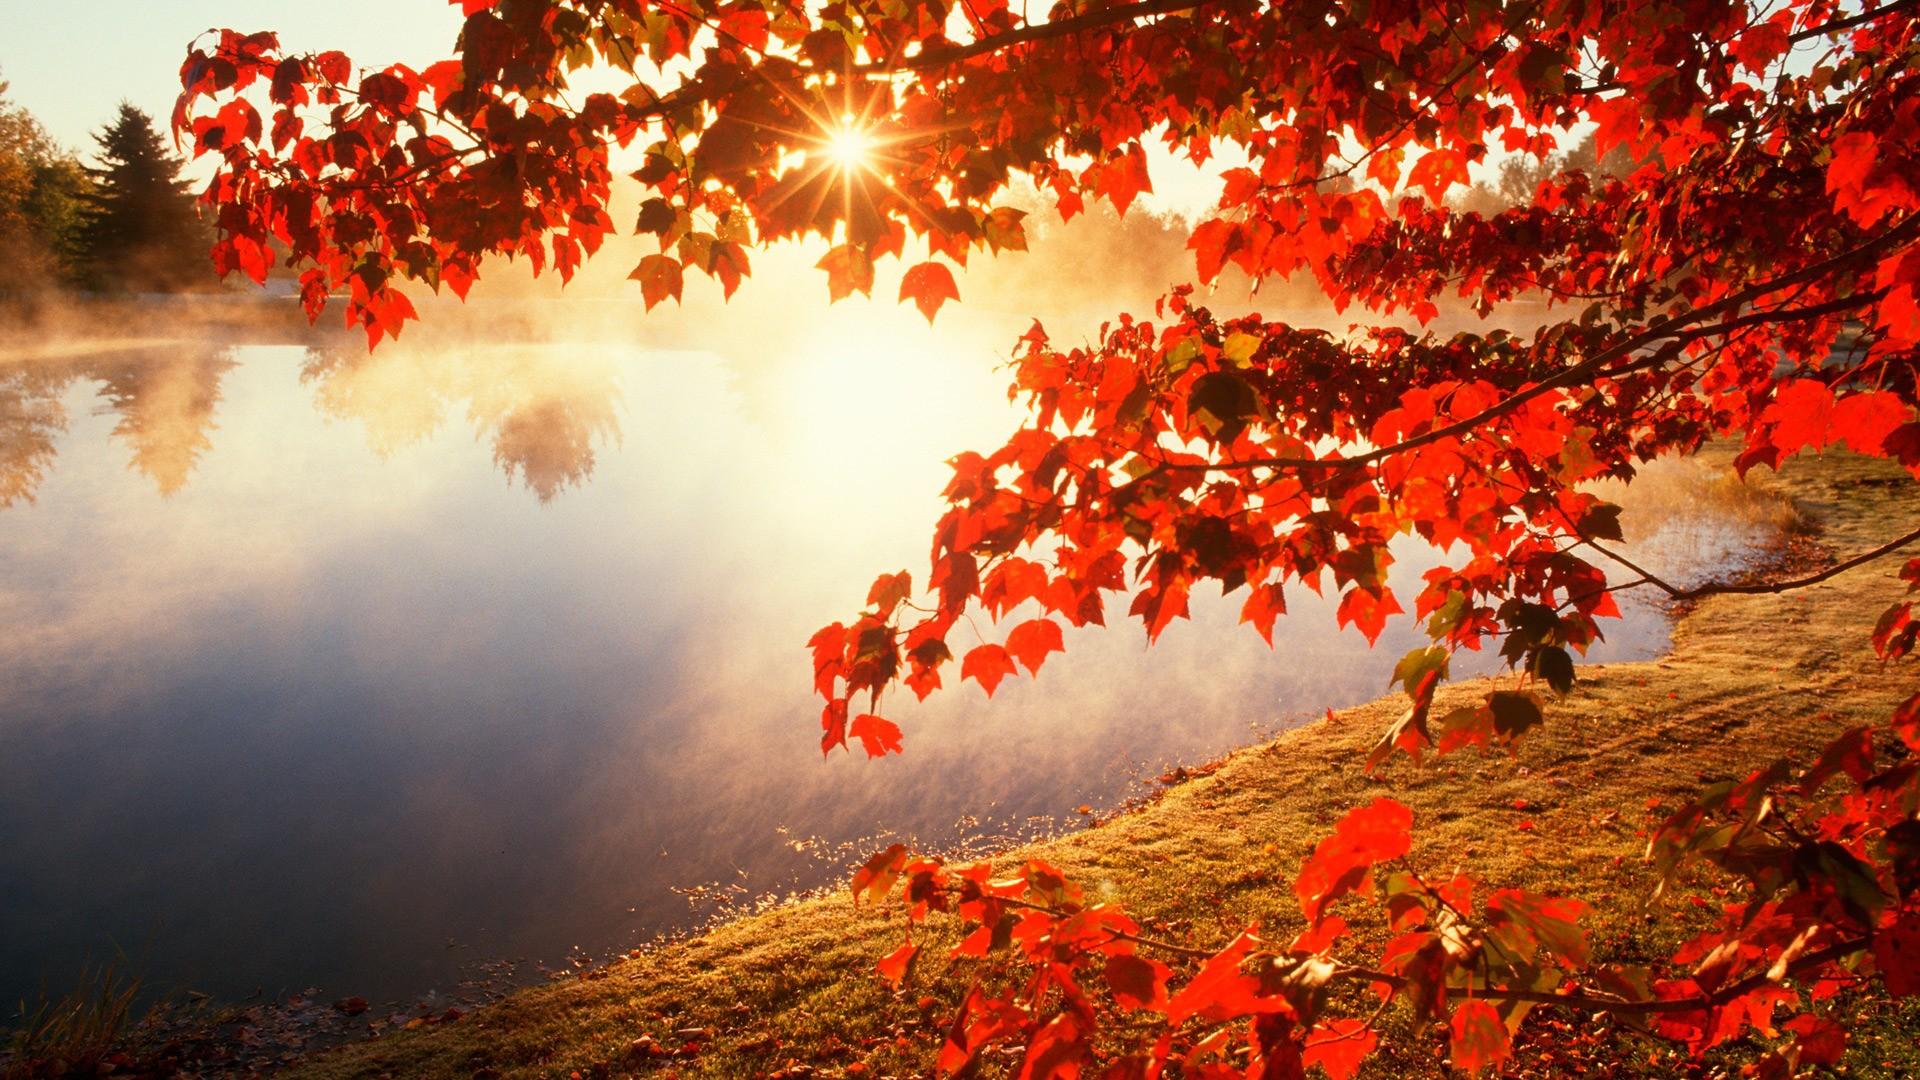 Free Desktop Wallpaper Fall Season 34 Autumn Wallpapers 183 ① Download Free Stunning Wallpapers